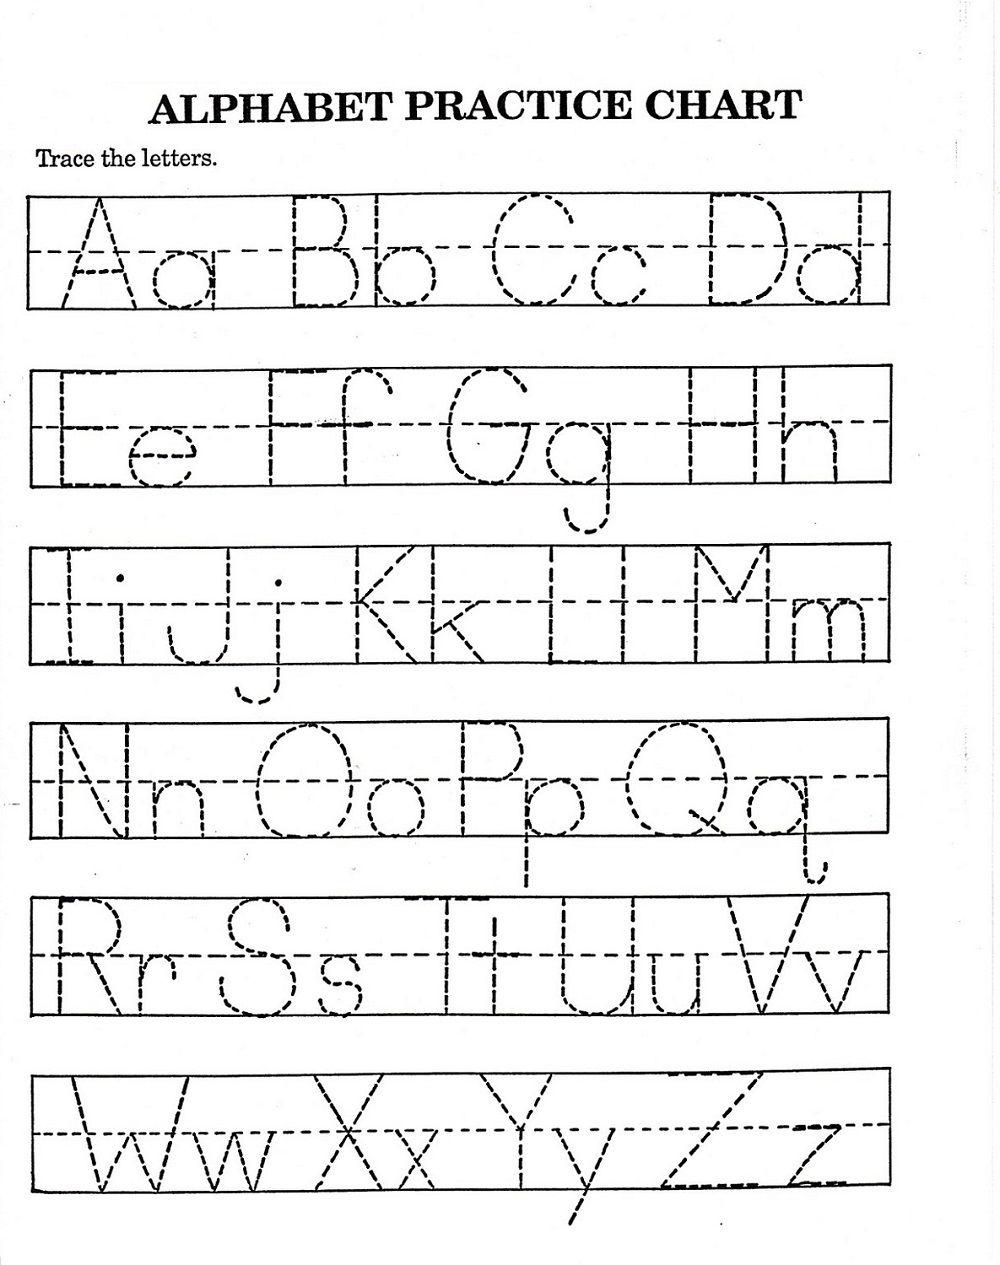 Az Worksheets For Kindergarten Traceable Alphabet Z Activity for Alphabet Handwriting Worksheets A To Z Pdf